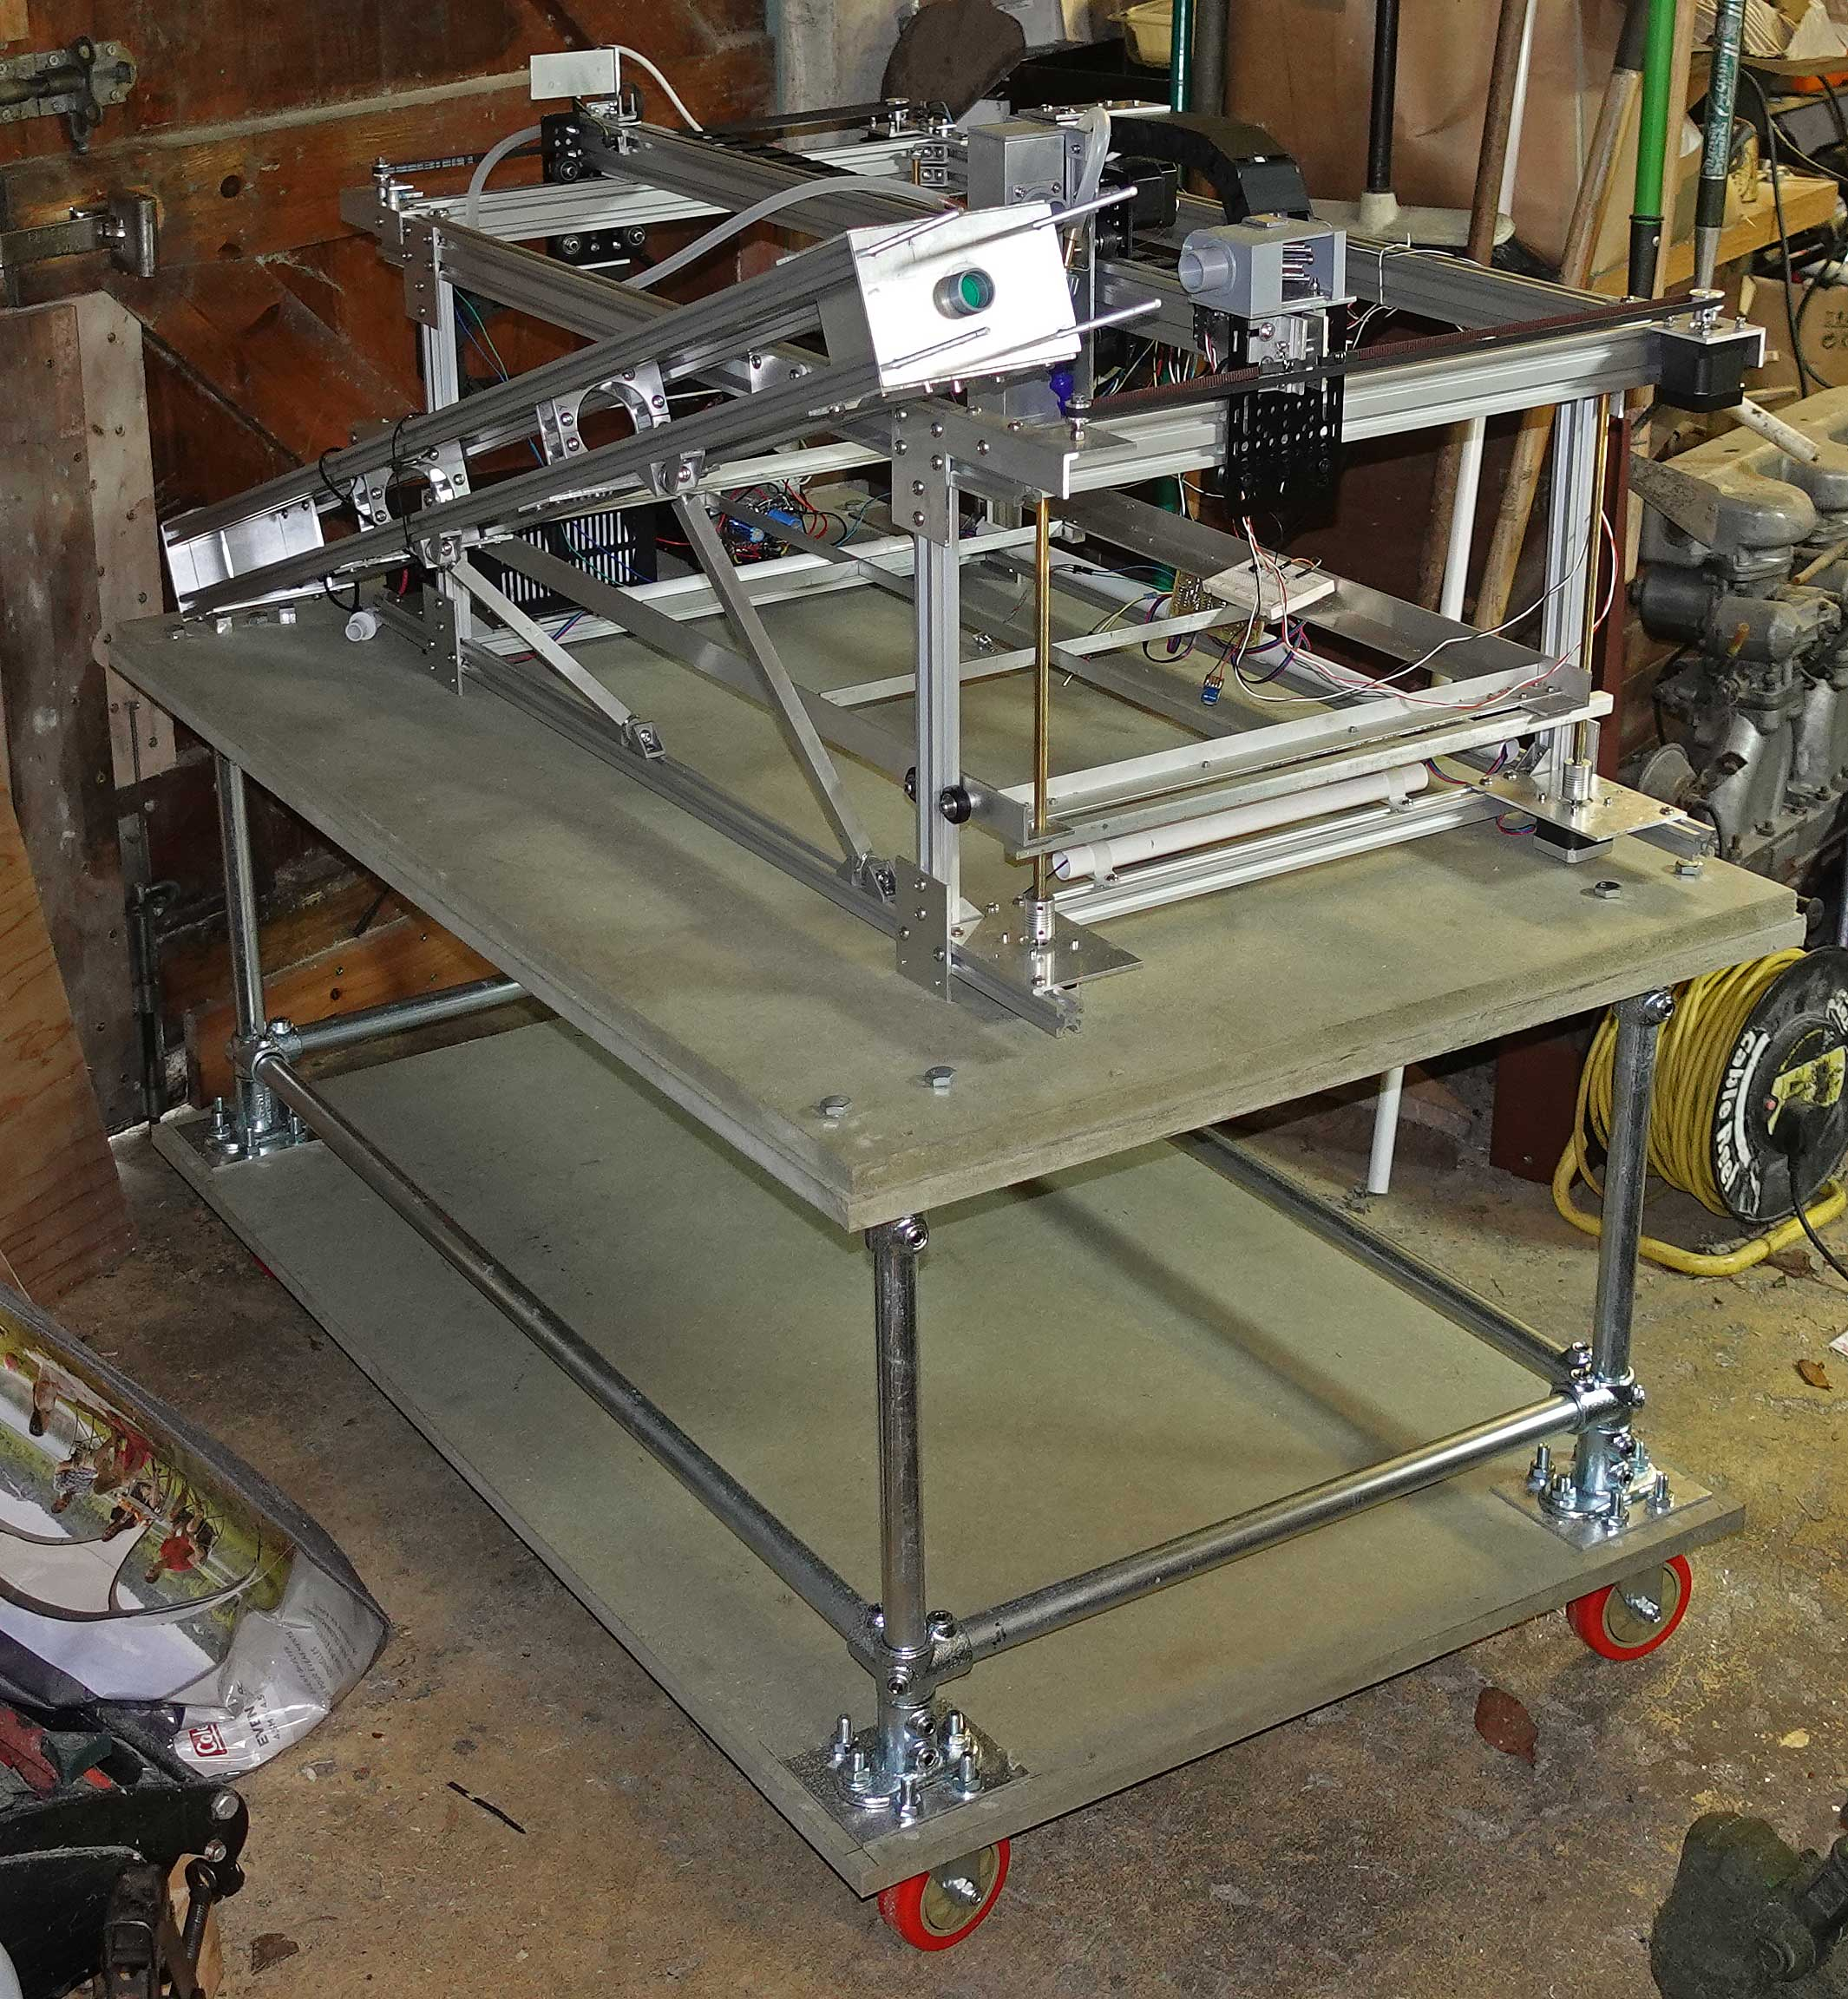 Laser cutter - test fitting on base